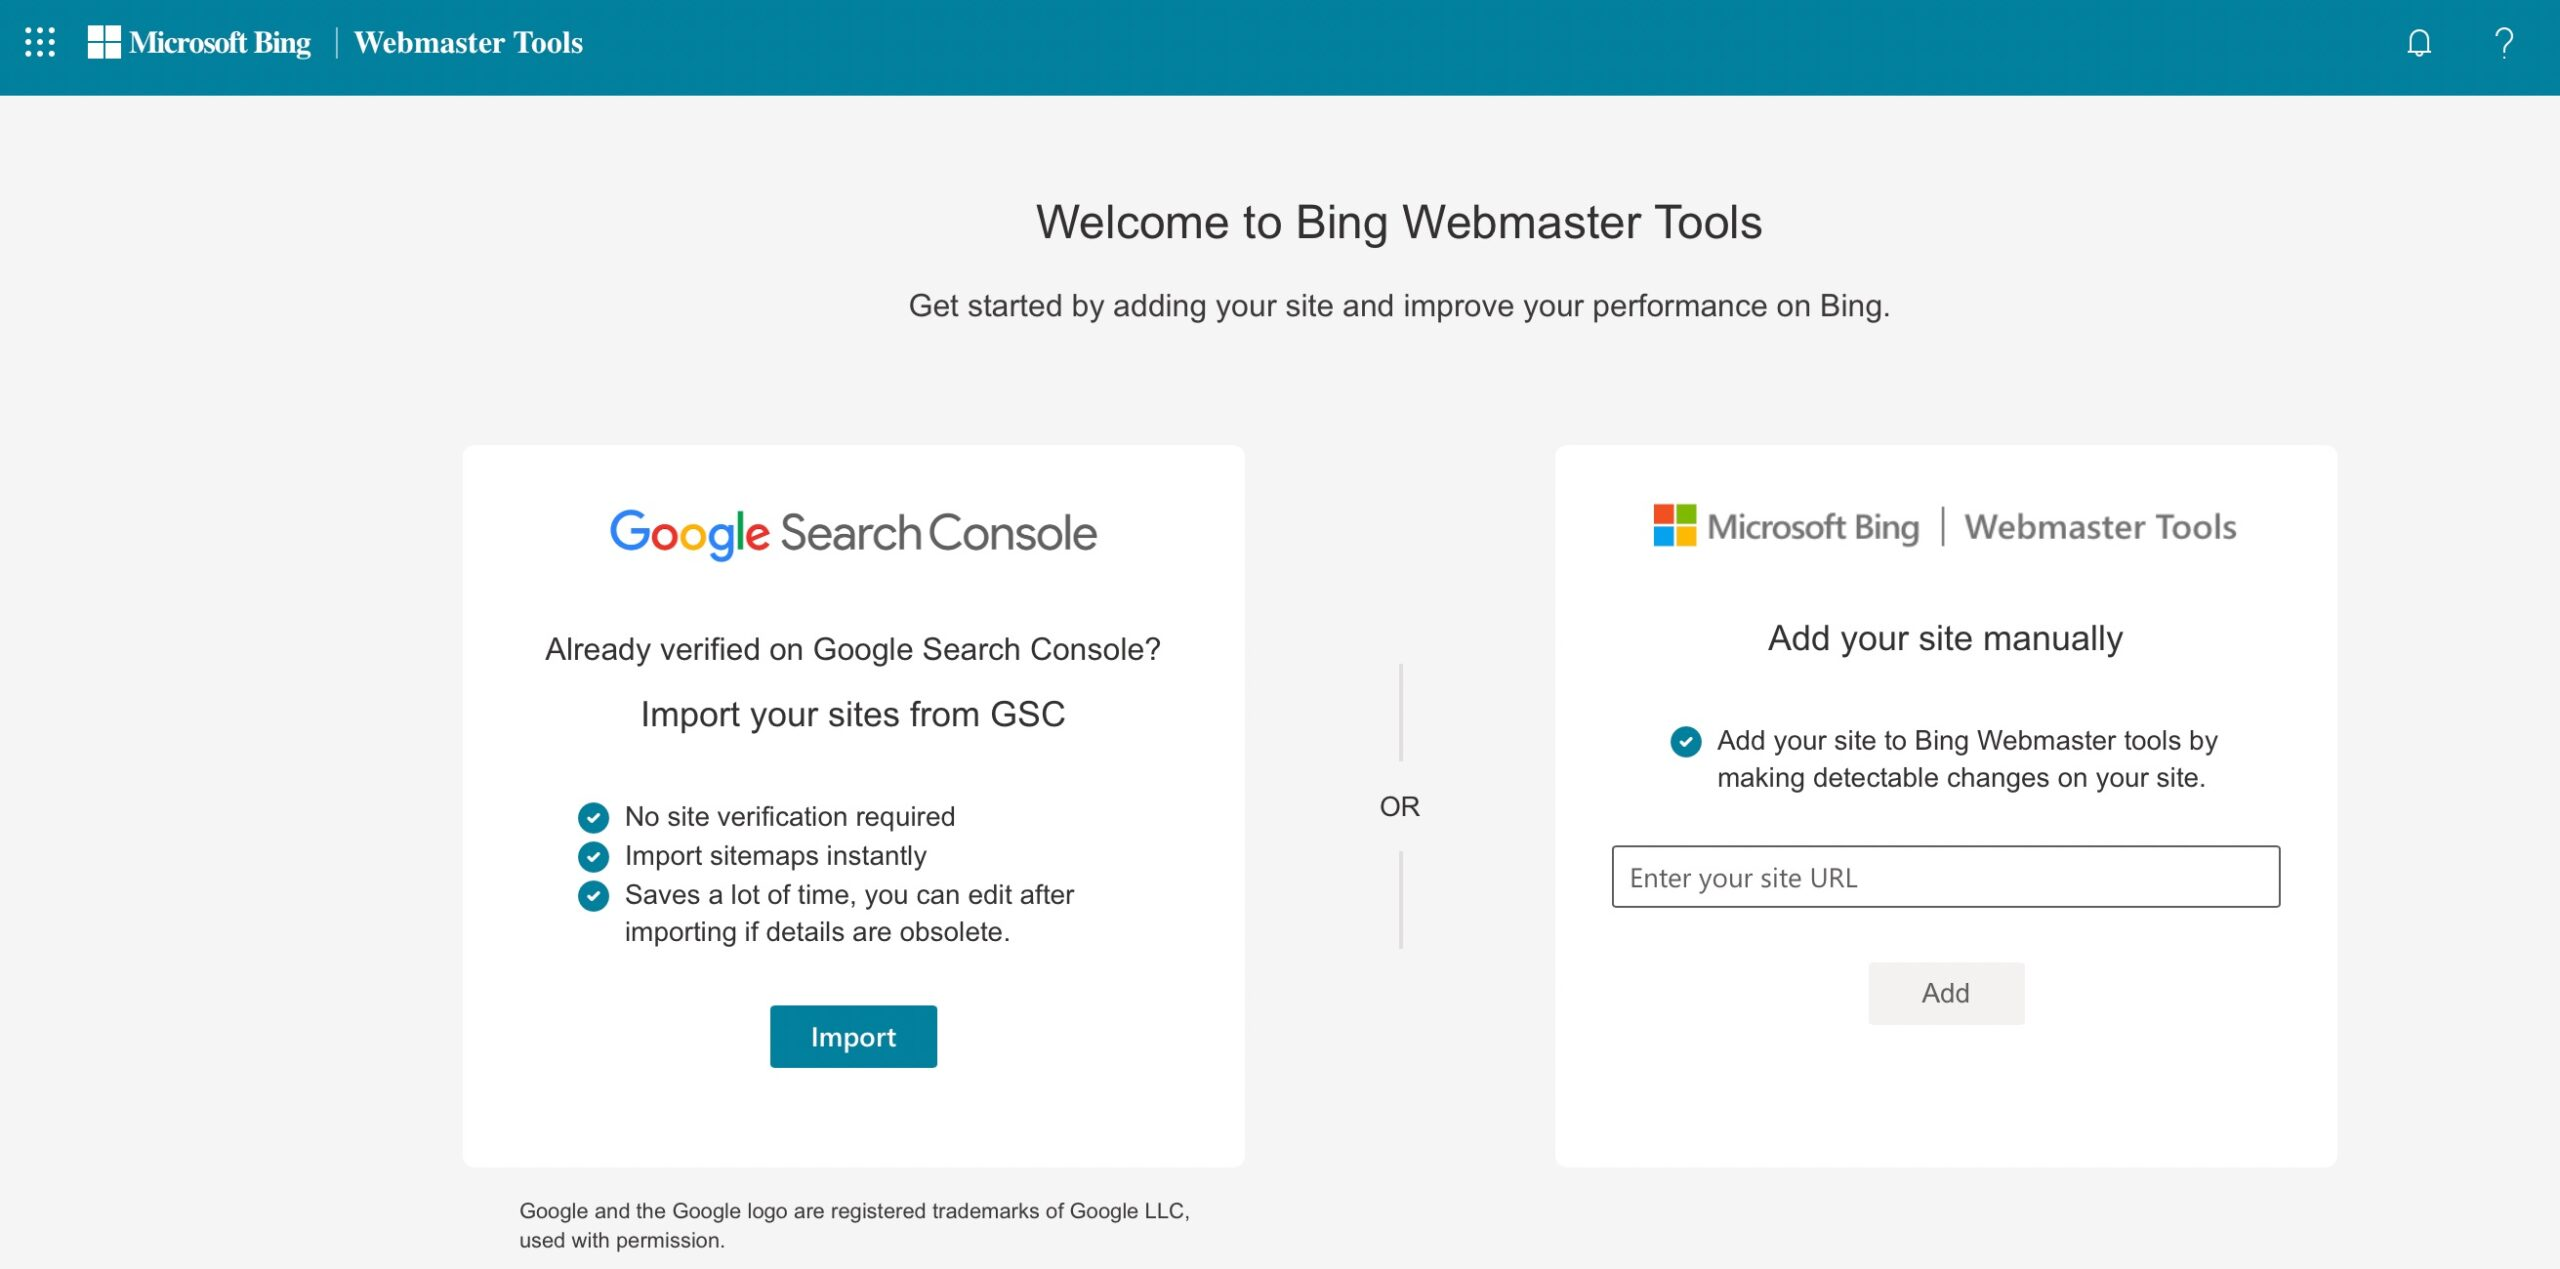 Create a Bing account